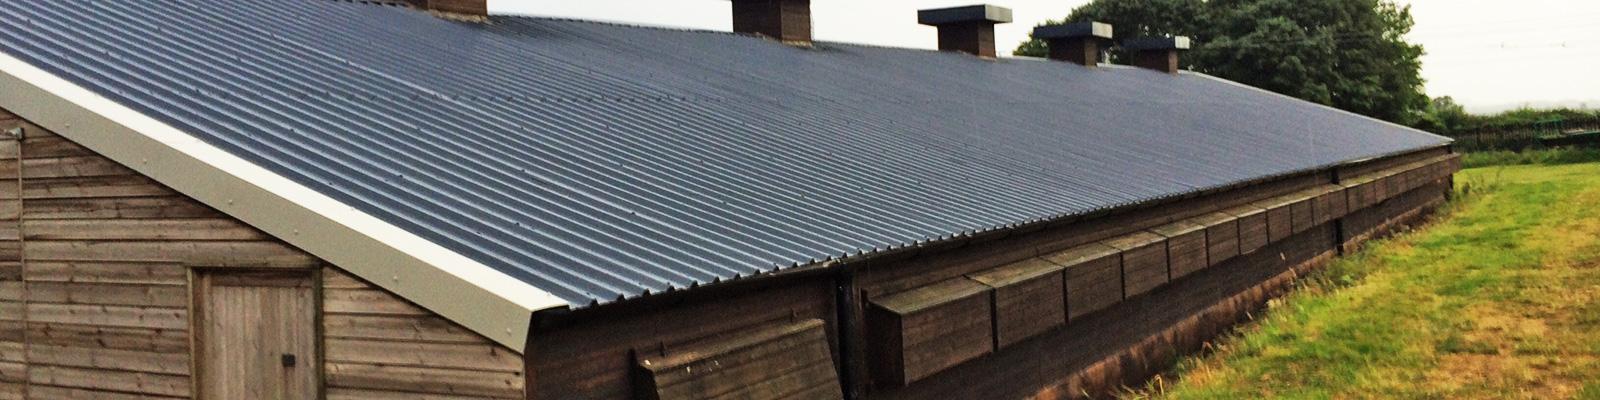 Industrial Asbestos Sheds Manufacturer in Gurugram